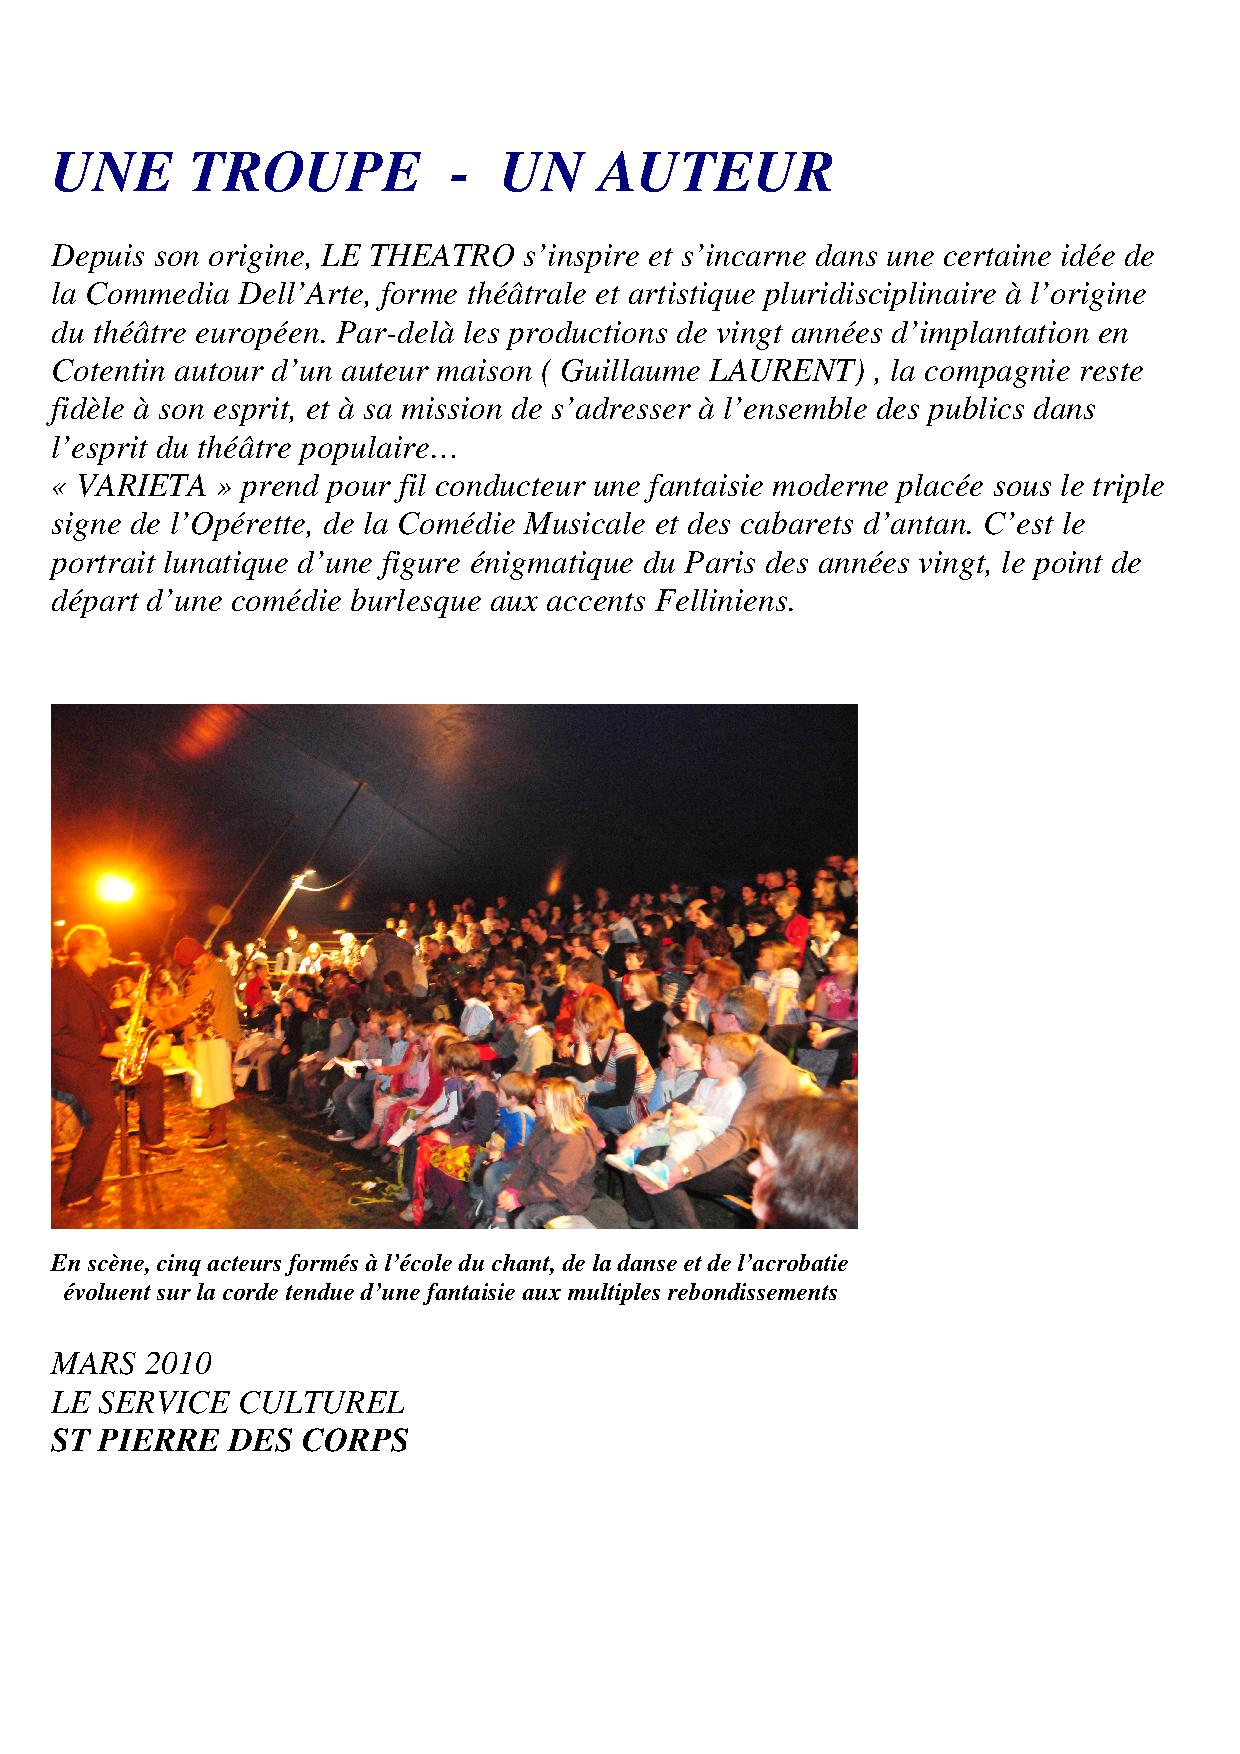 ARTICLE VARIETA 1-4.jpg